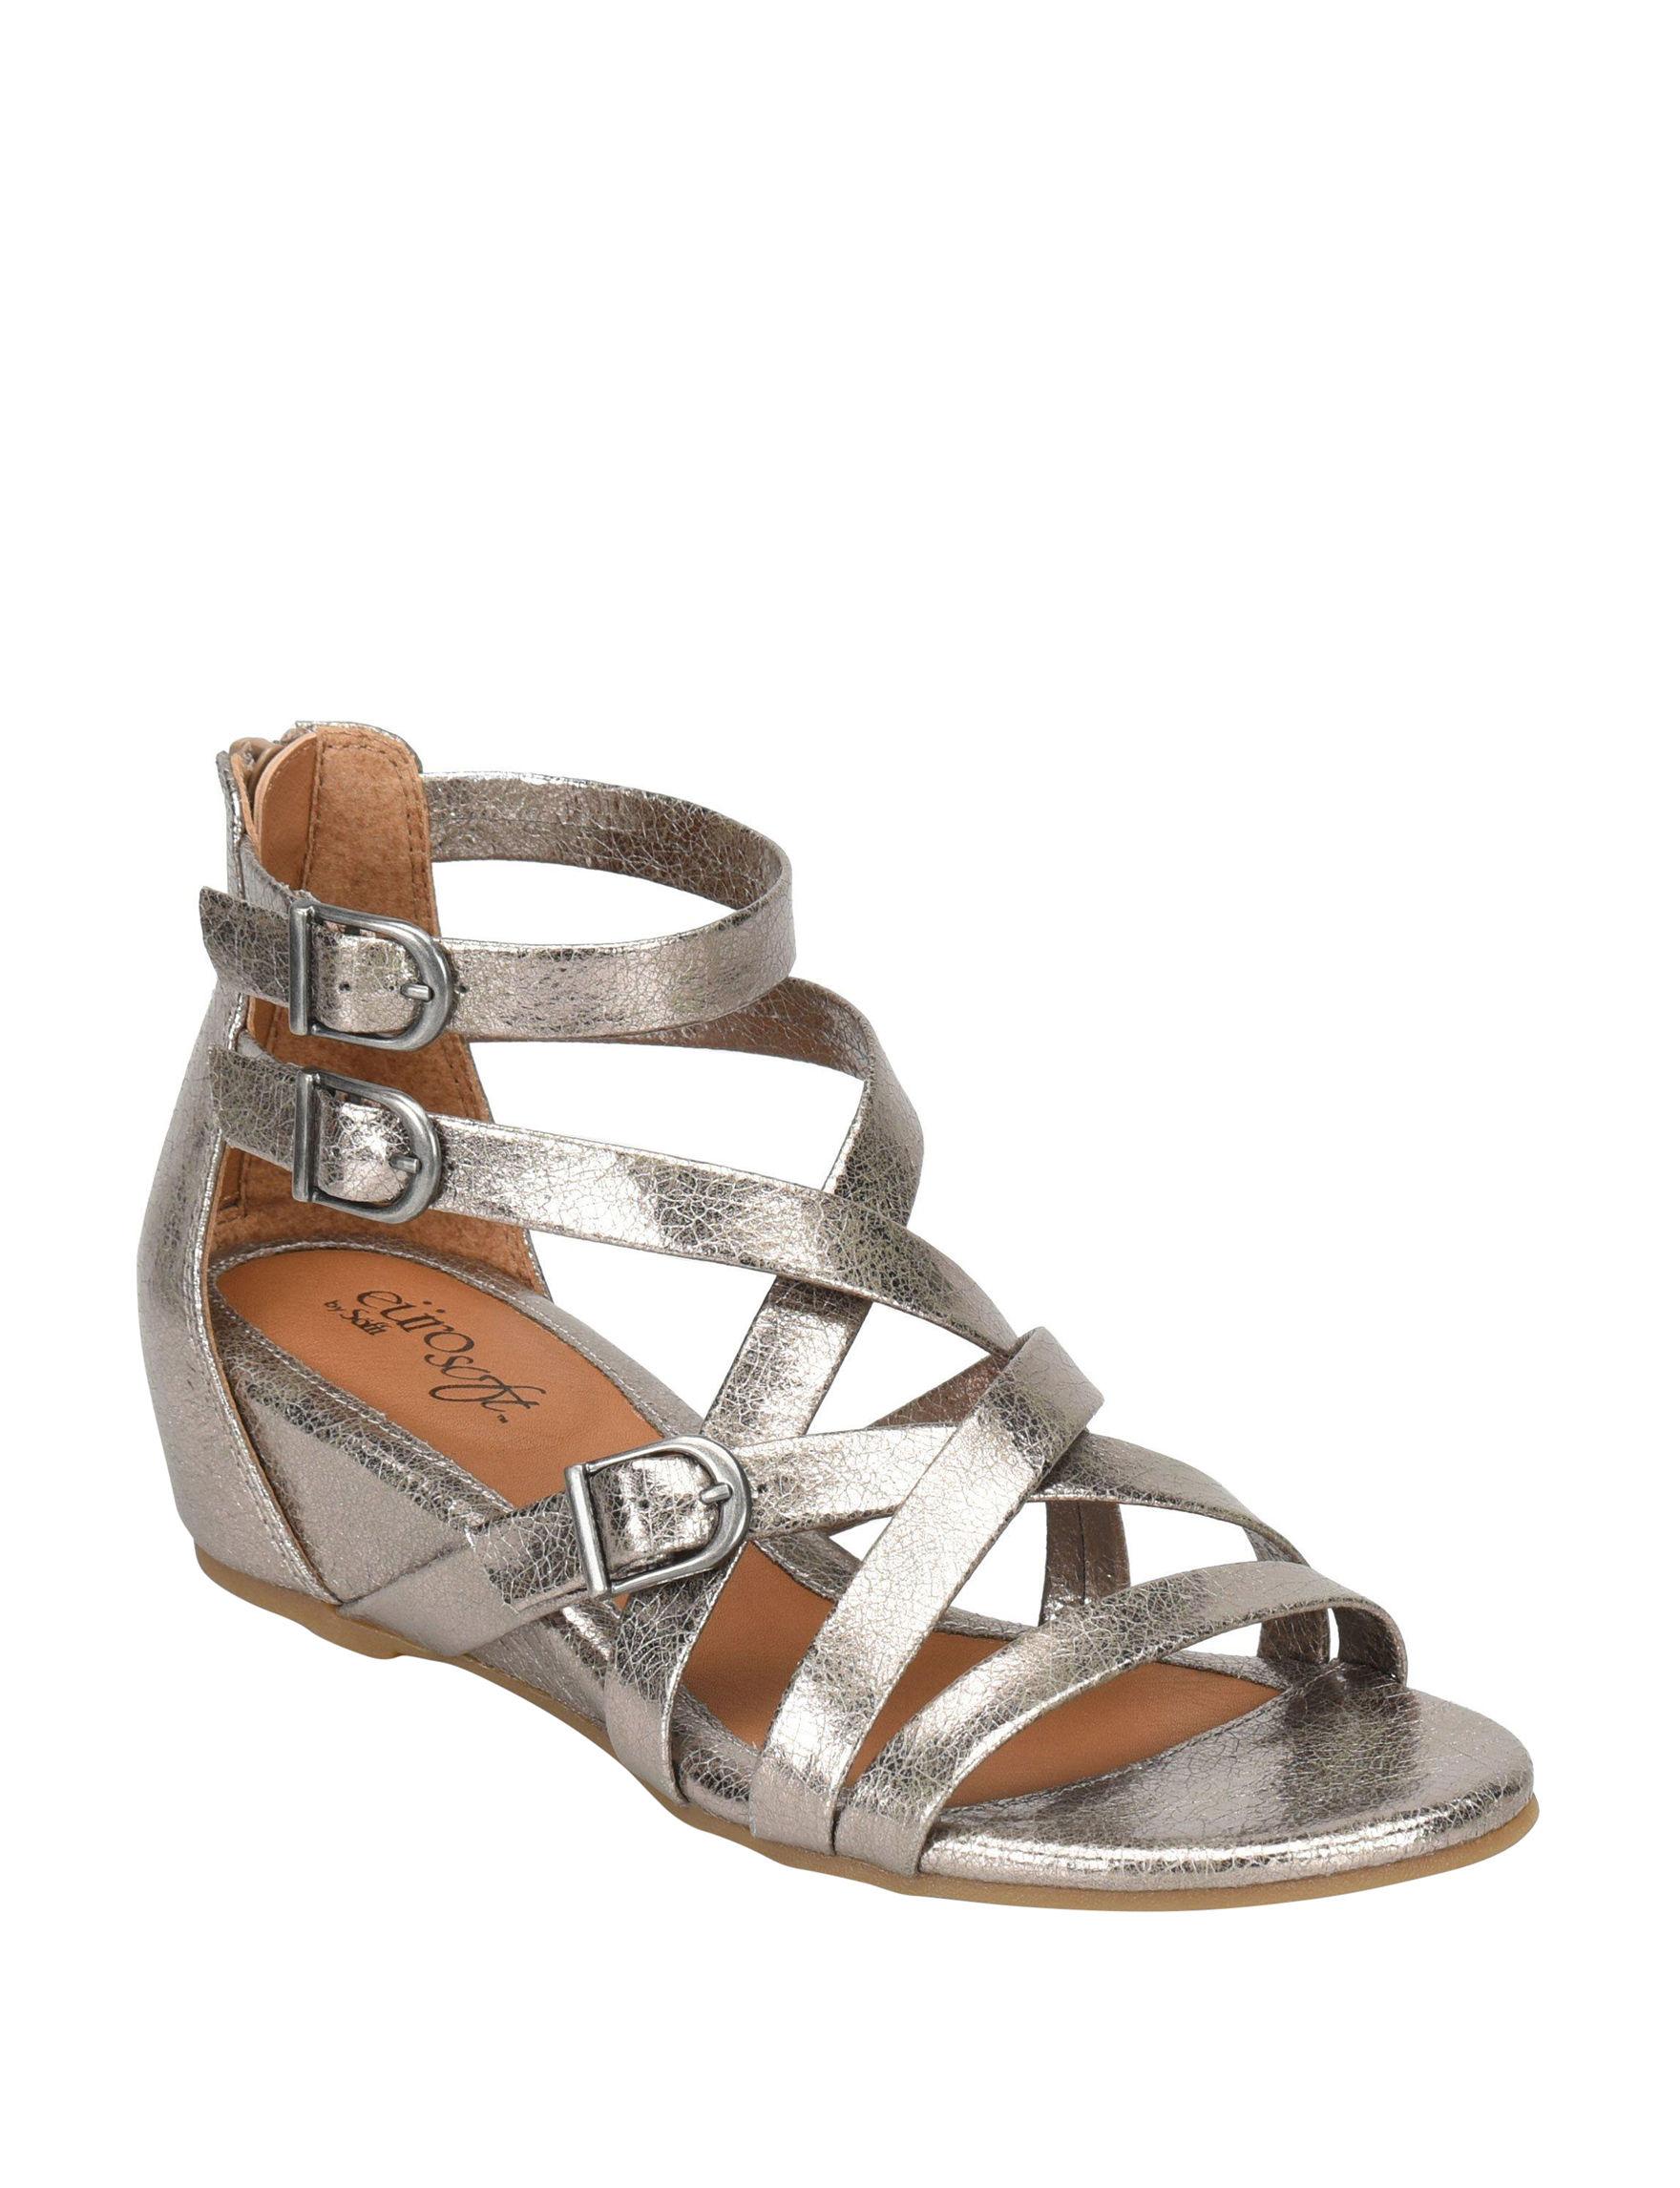 19b4fcfc6aee Eurosoft Silver Wedge Sandals